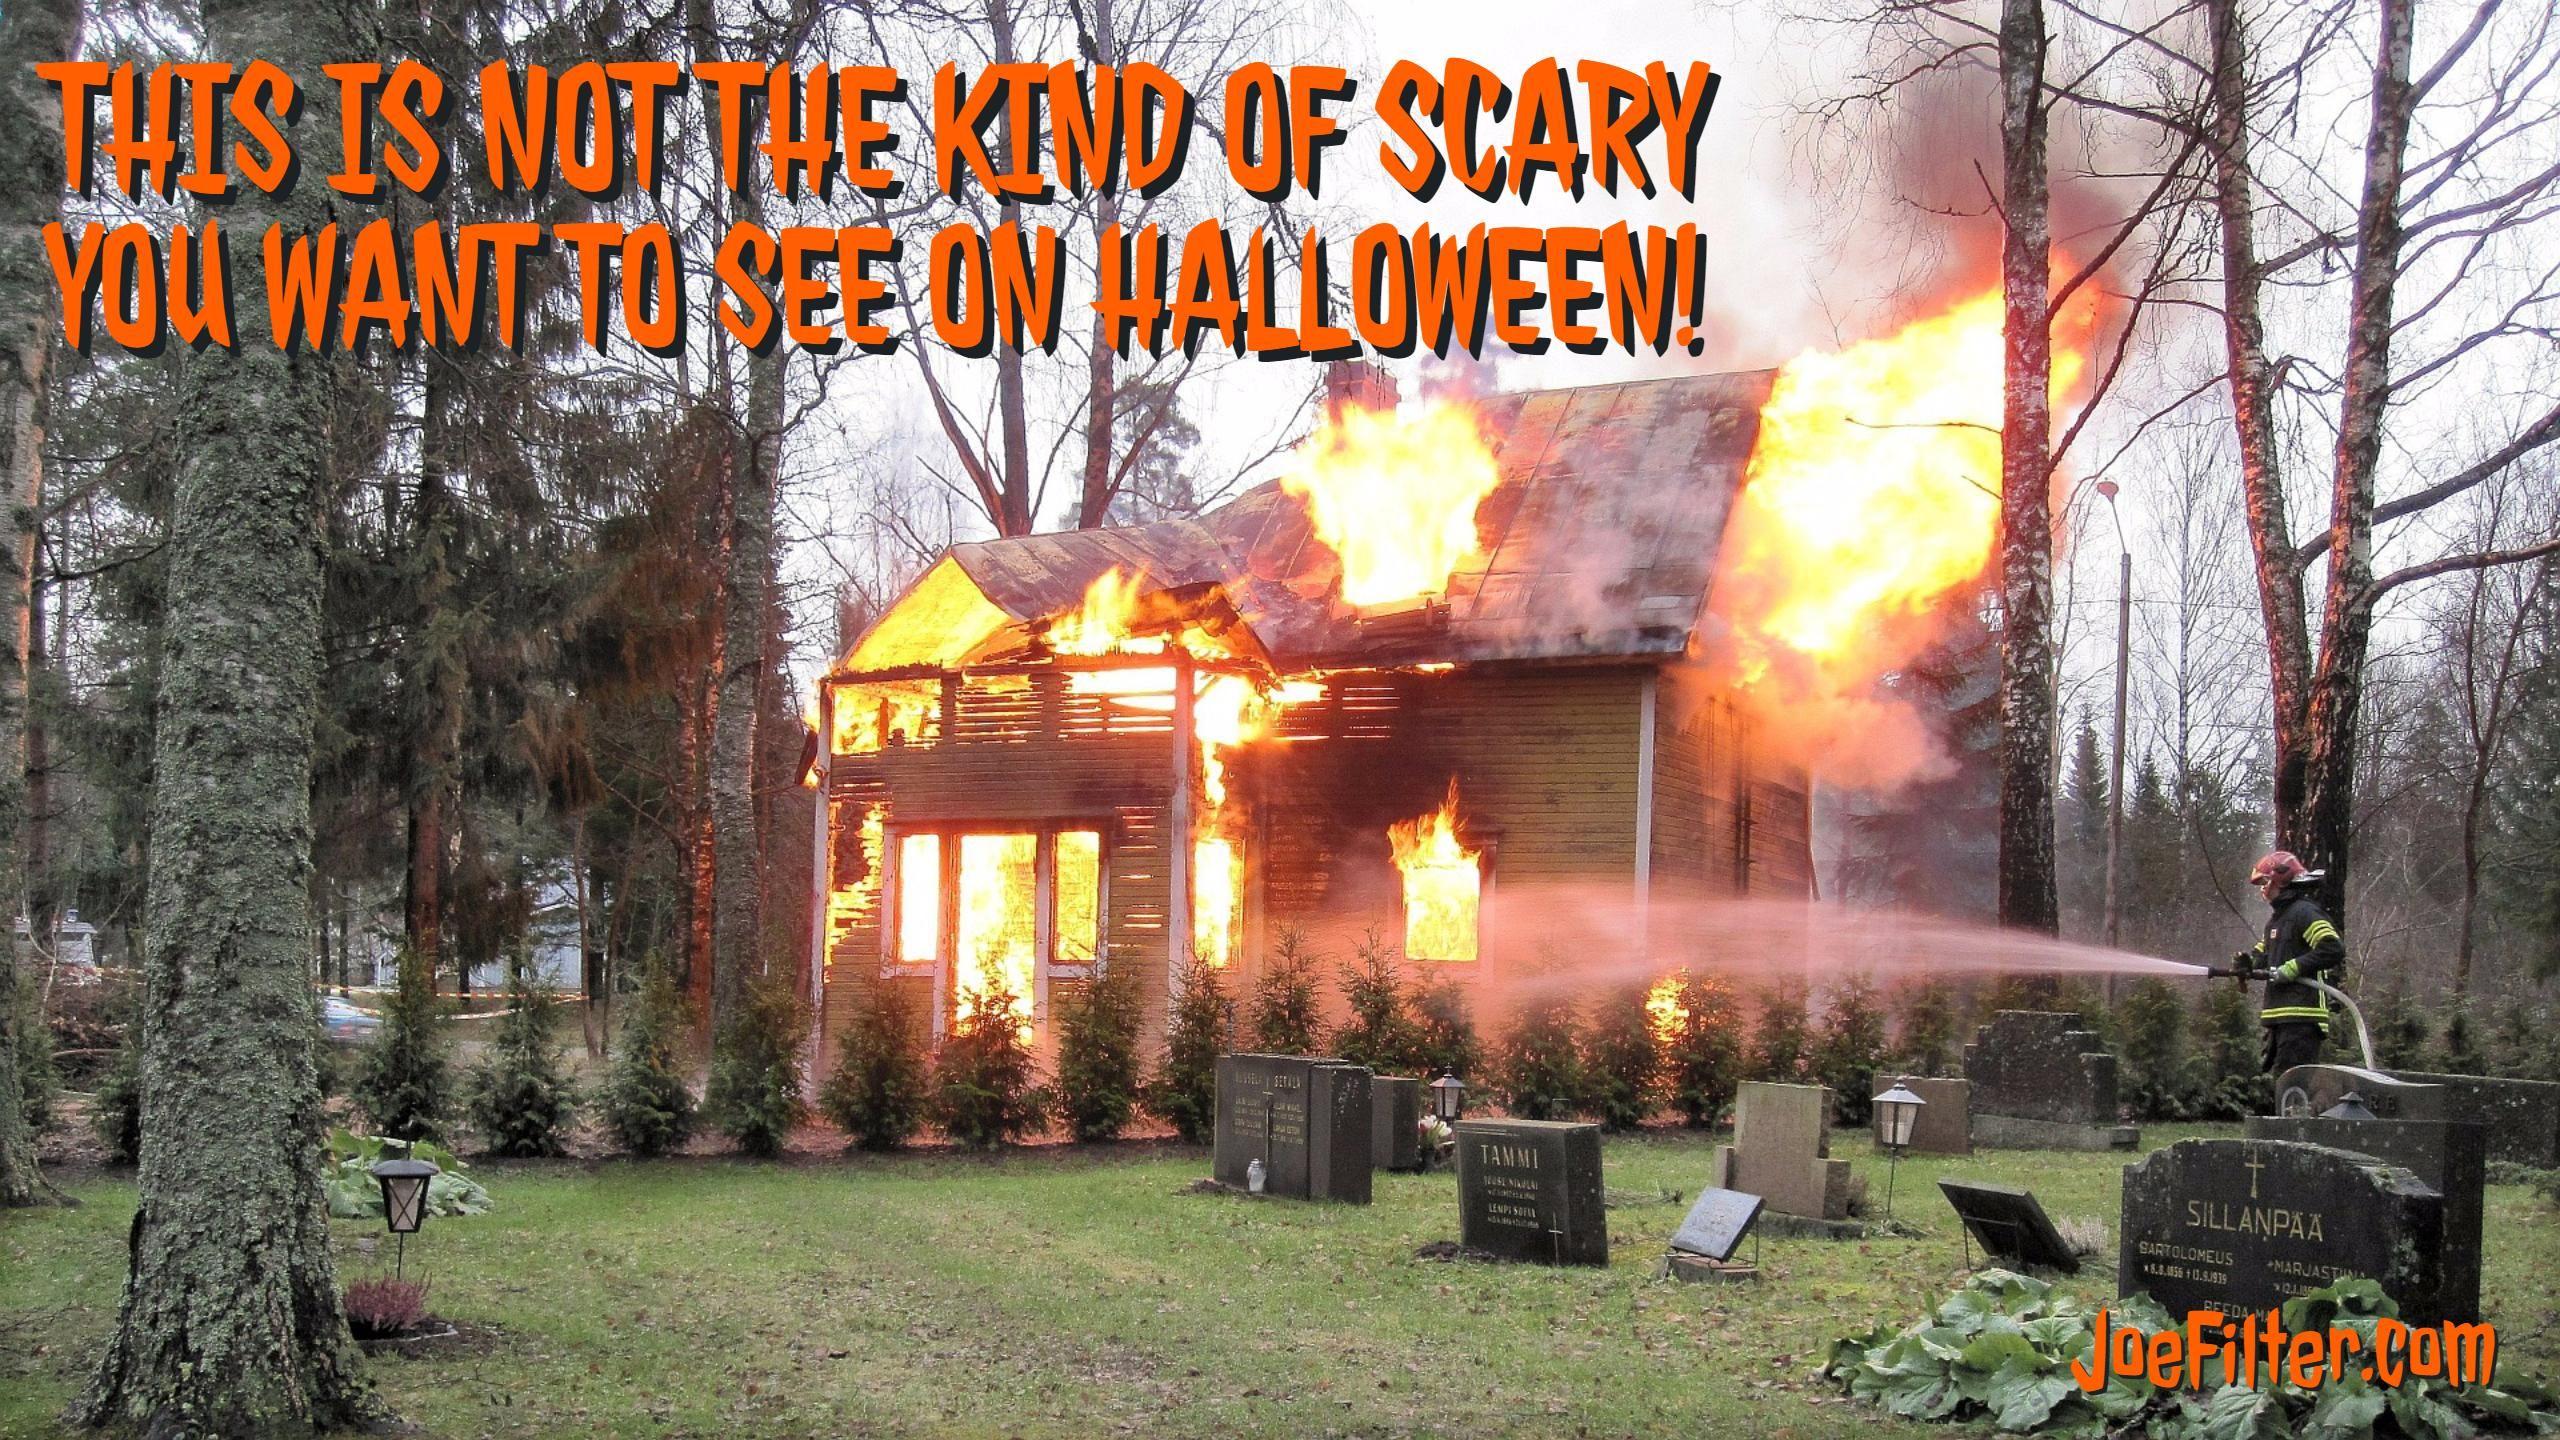 House fires are no joke! Make sure your smoke detectors